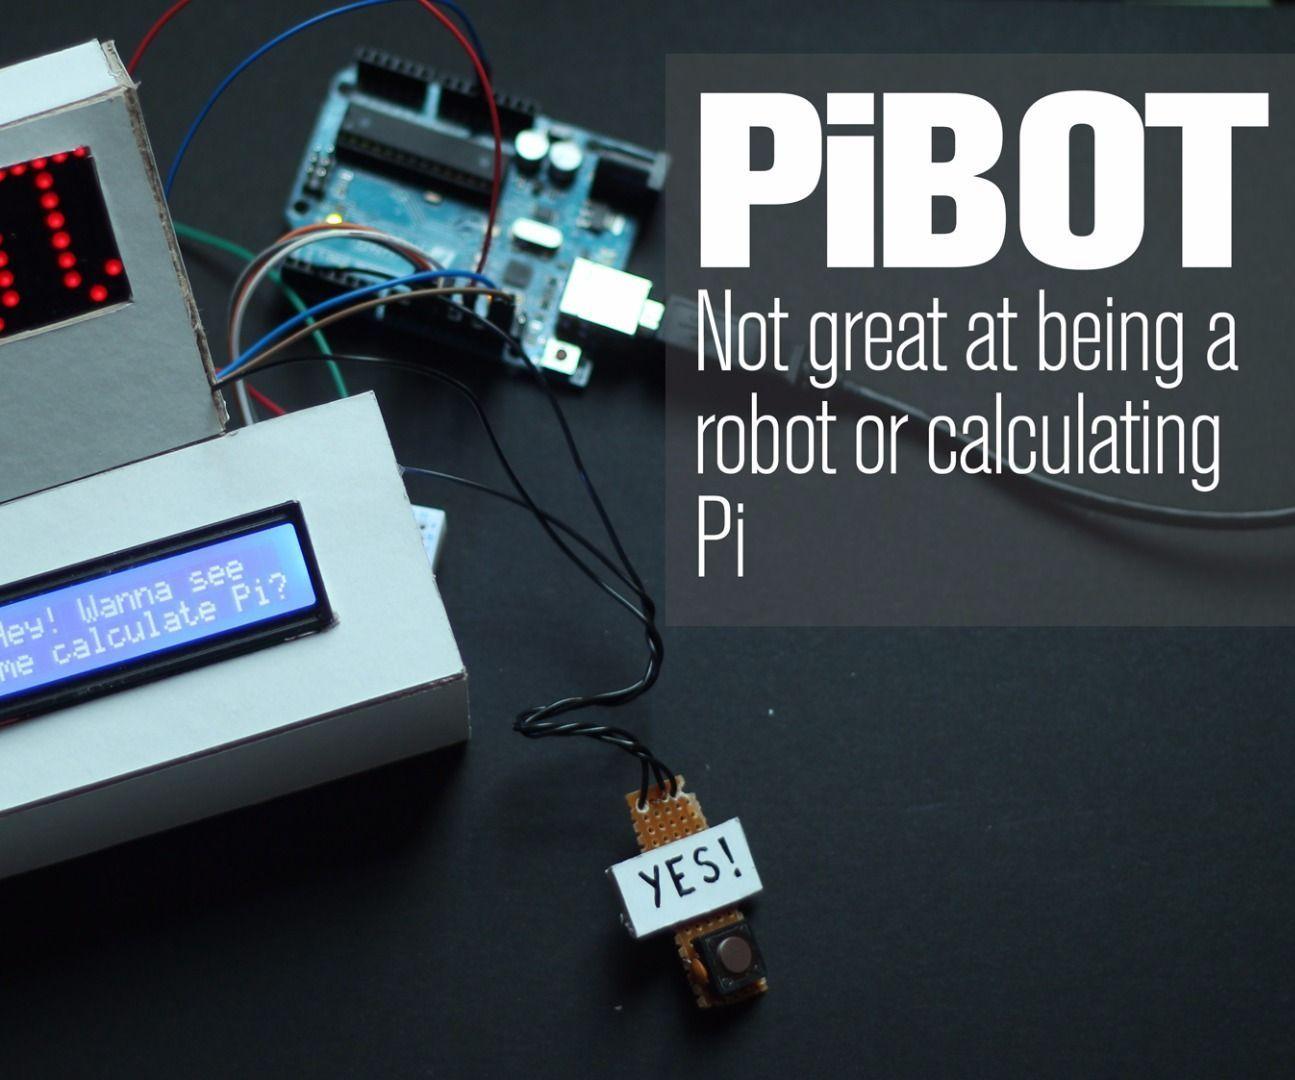 Pibot Calculating Pi With An Arduino Uno Calculating Pi